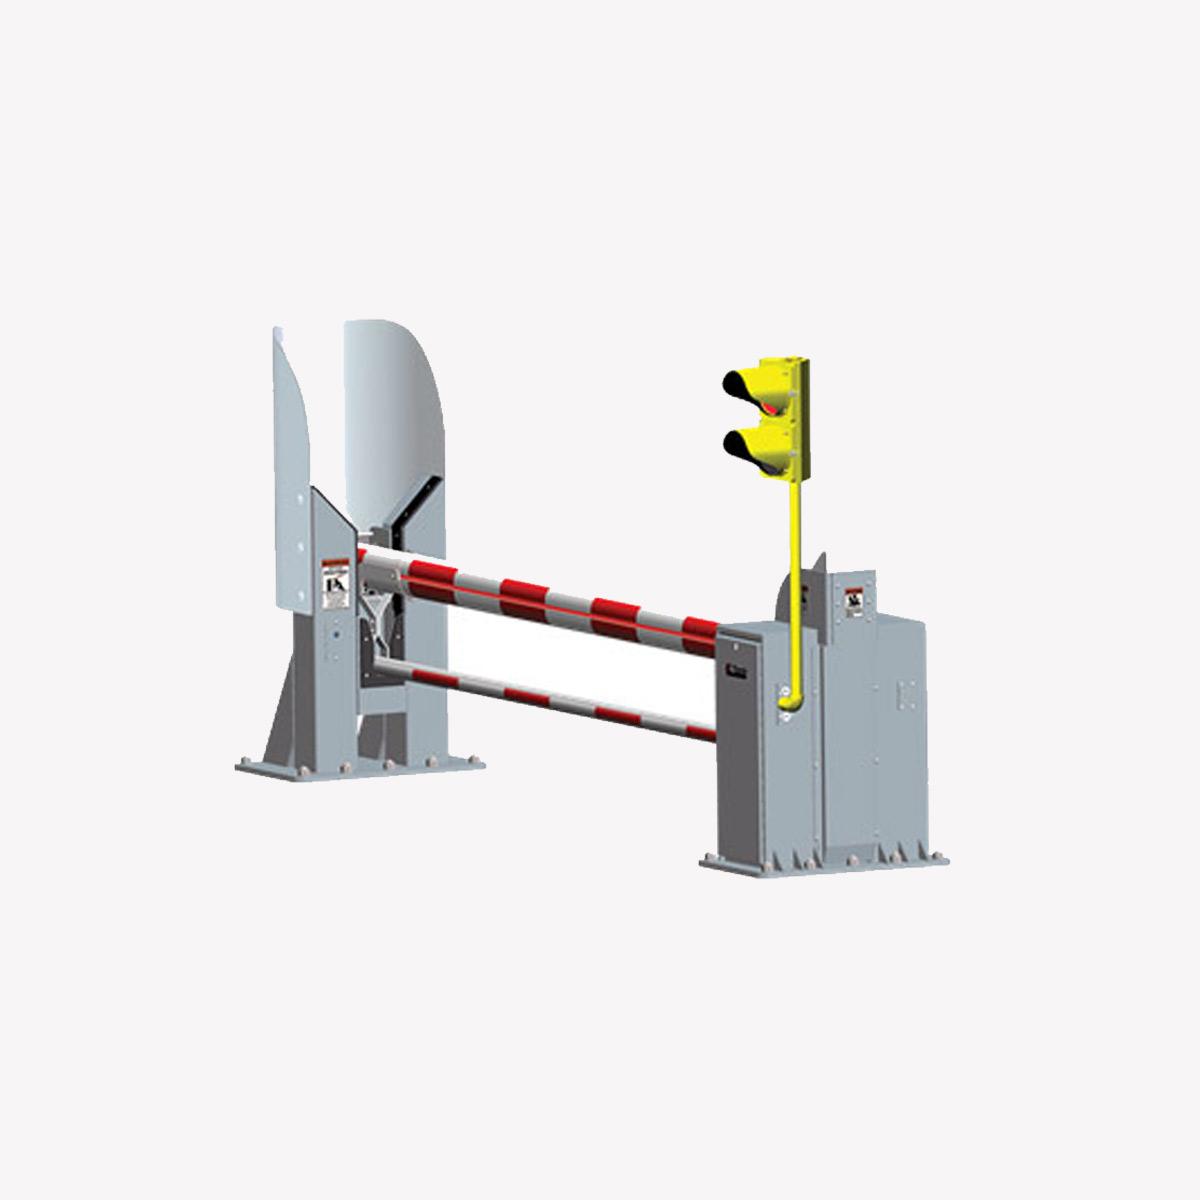 HySecurity-StrongArm-Barrier-M50